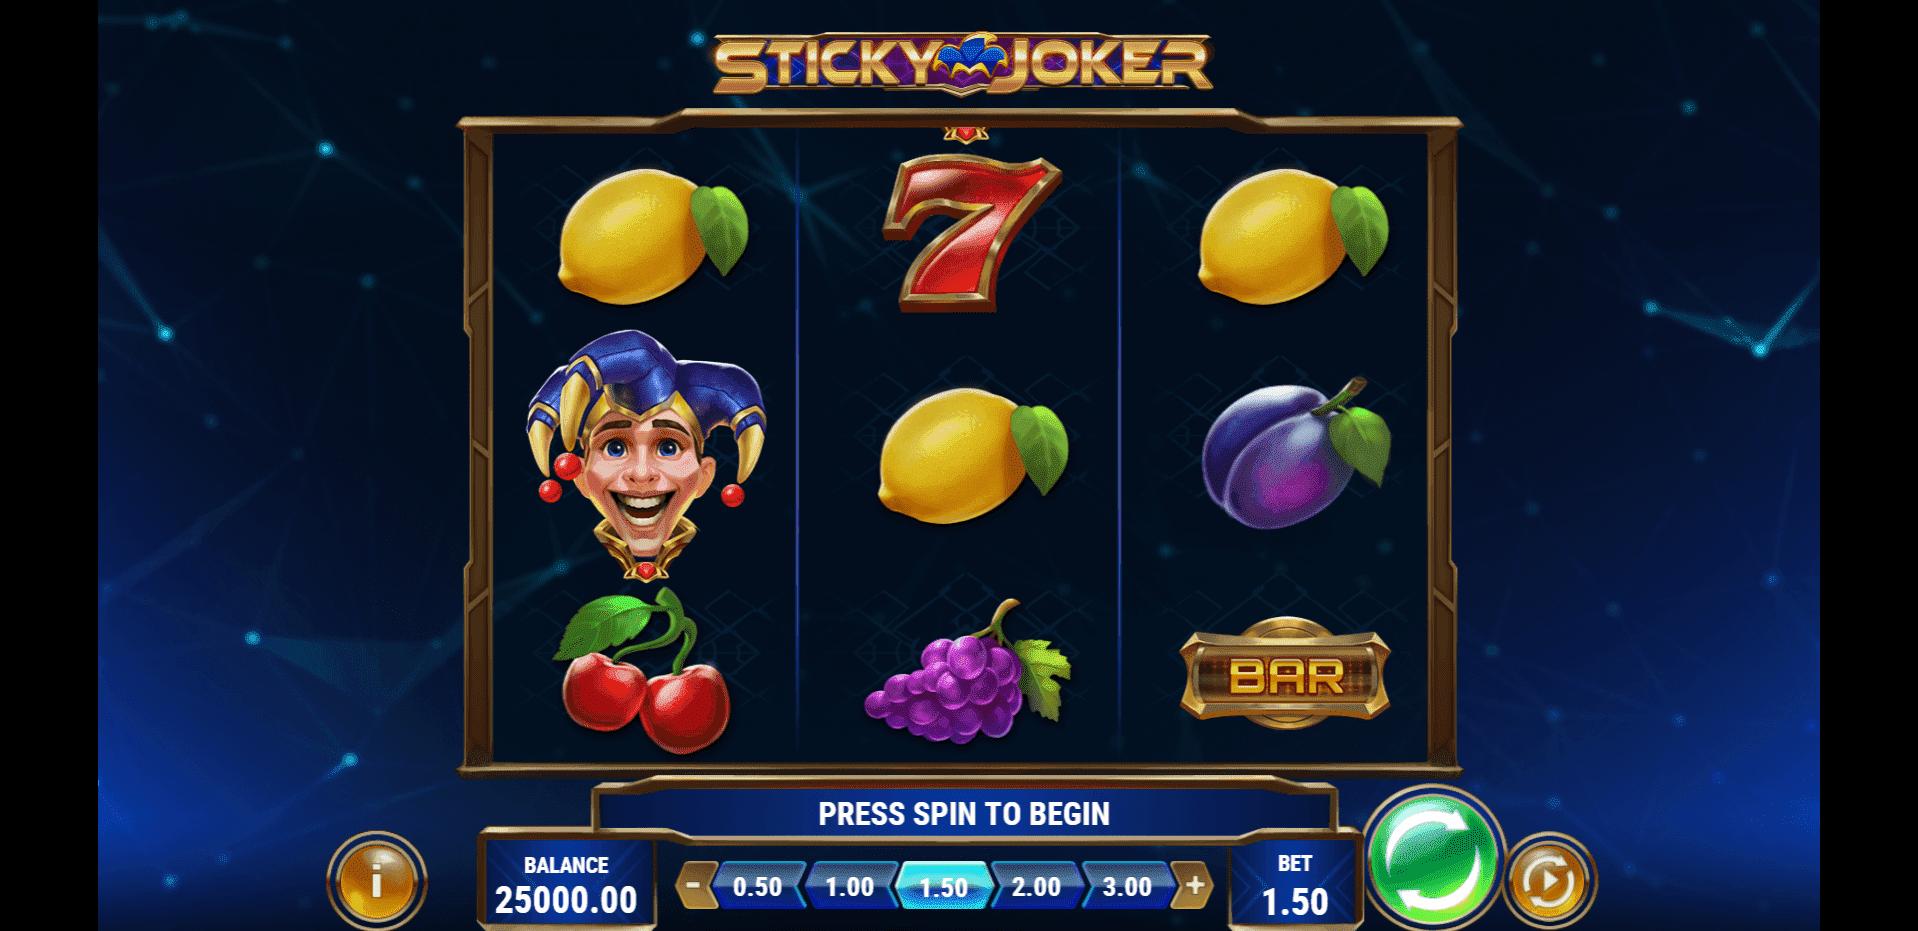 Sticky Joker slot machine screenshot